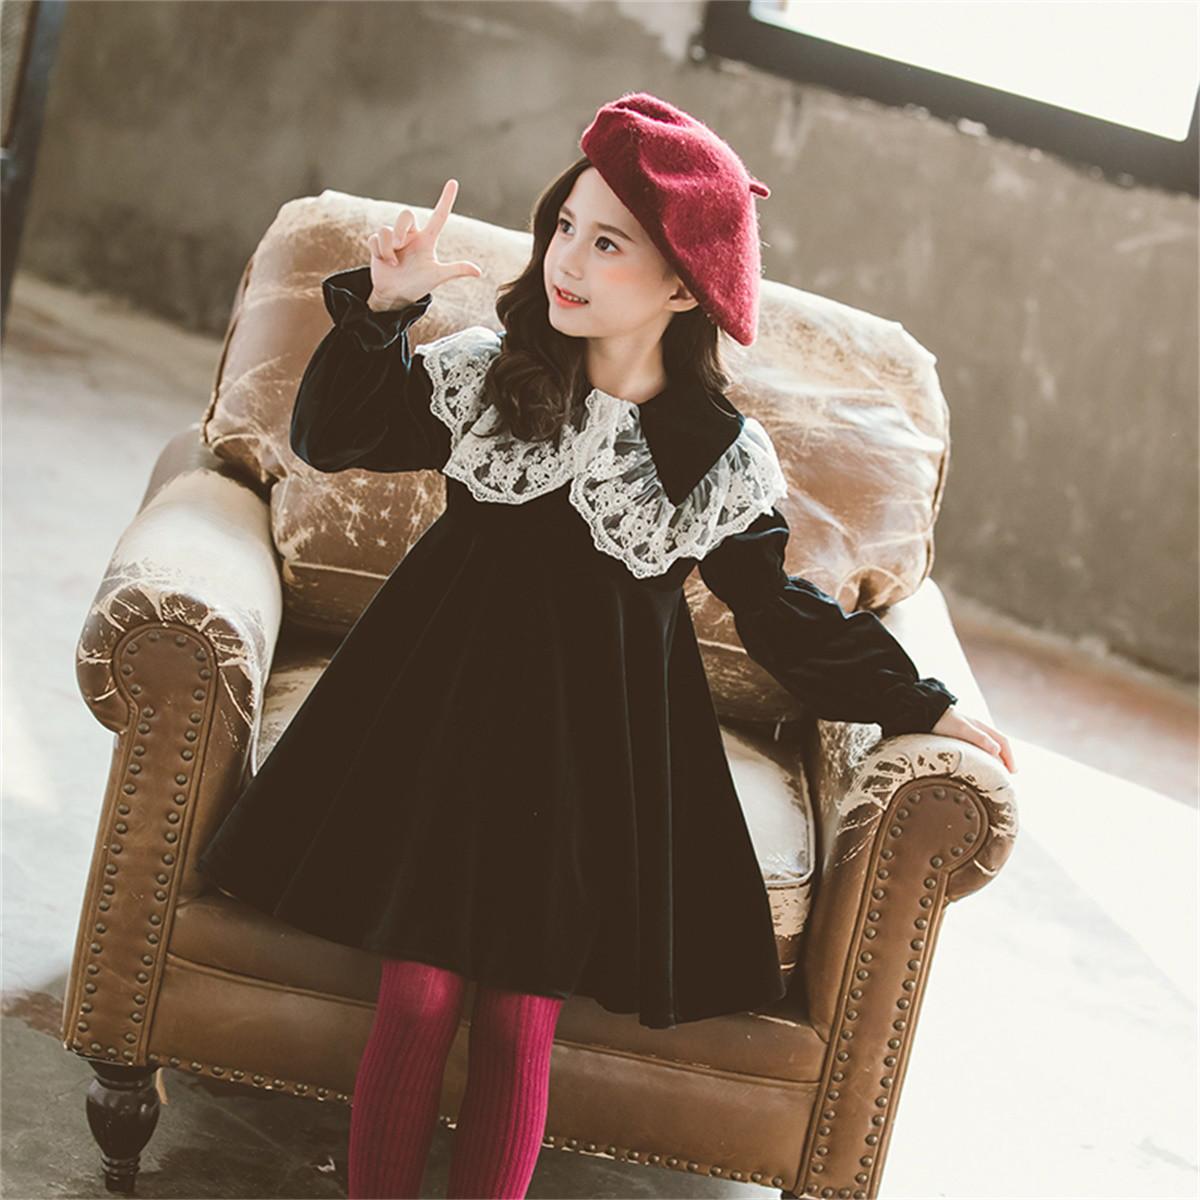 dme·kids德玛纳童装20春新款女童儿童裙子公主裙蕾丝拼接连衣裙Q534451525094902